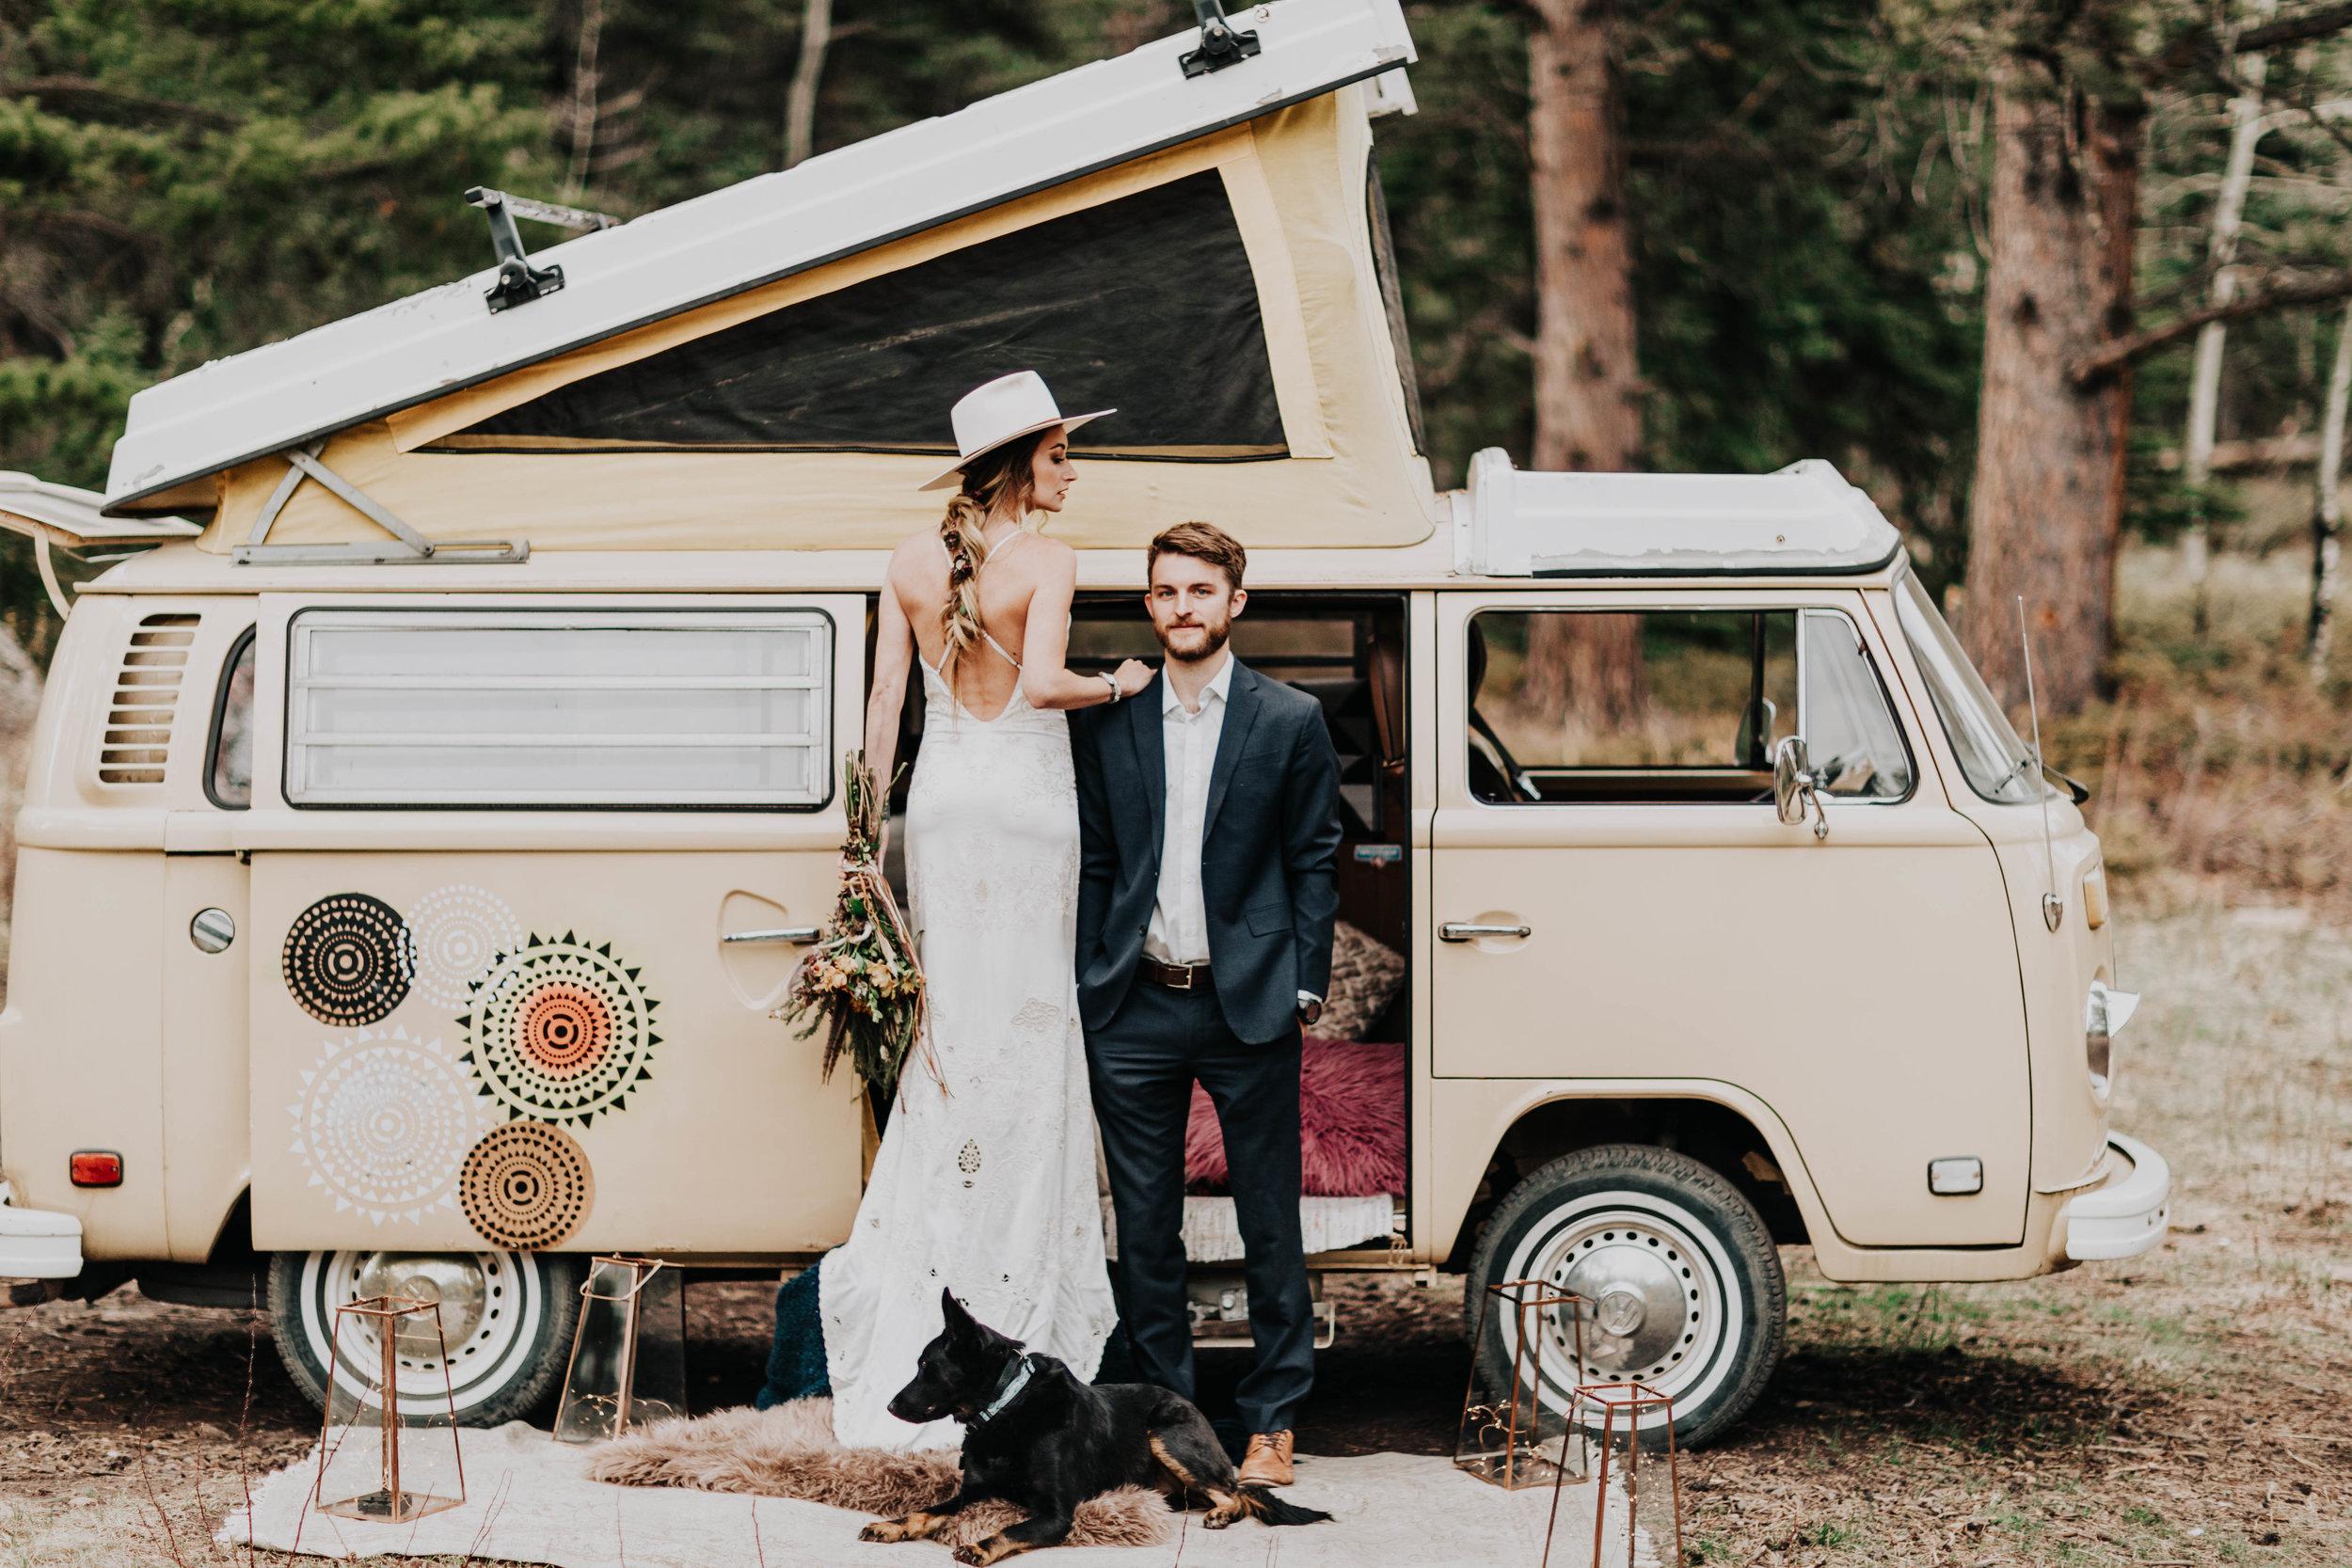 Sheena_Shahangian_Photography_Wedding_Photo_Shoot_Van_Life_Colorado_Rayne_and_Michael-119.jpg